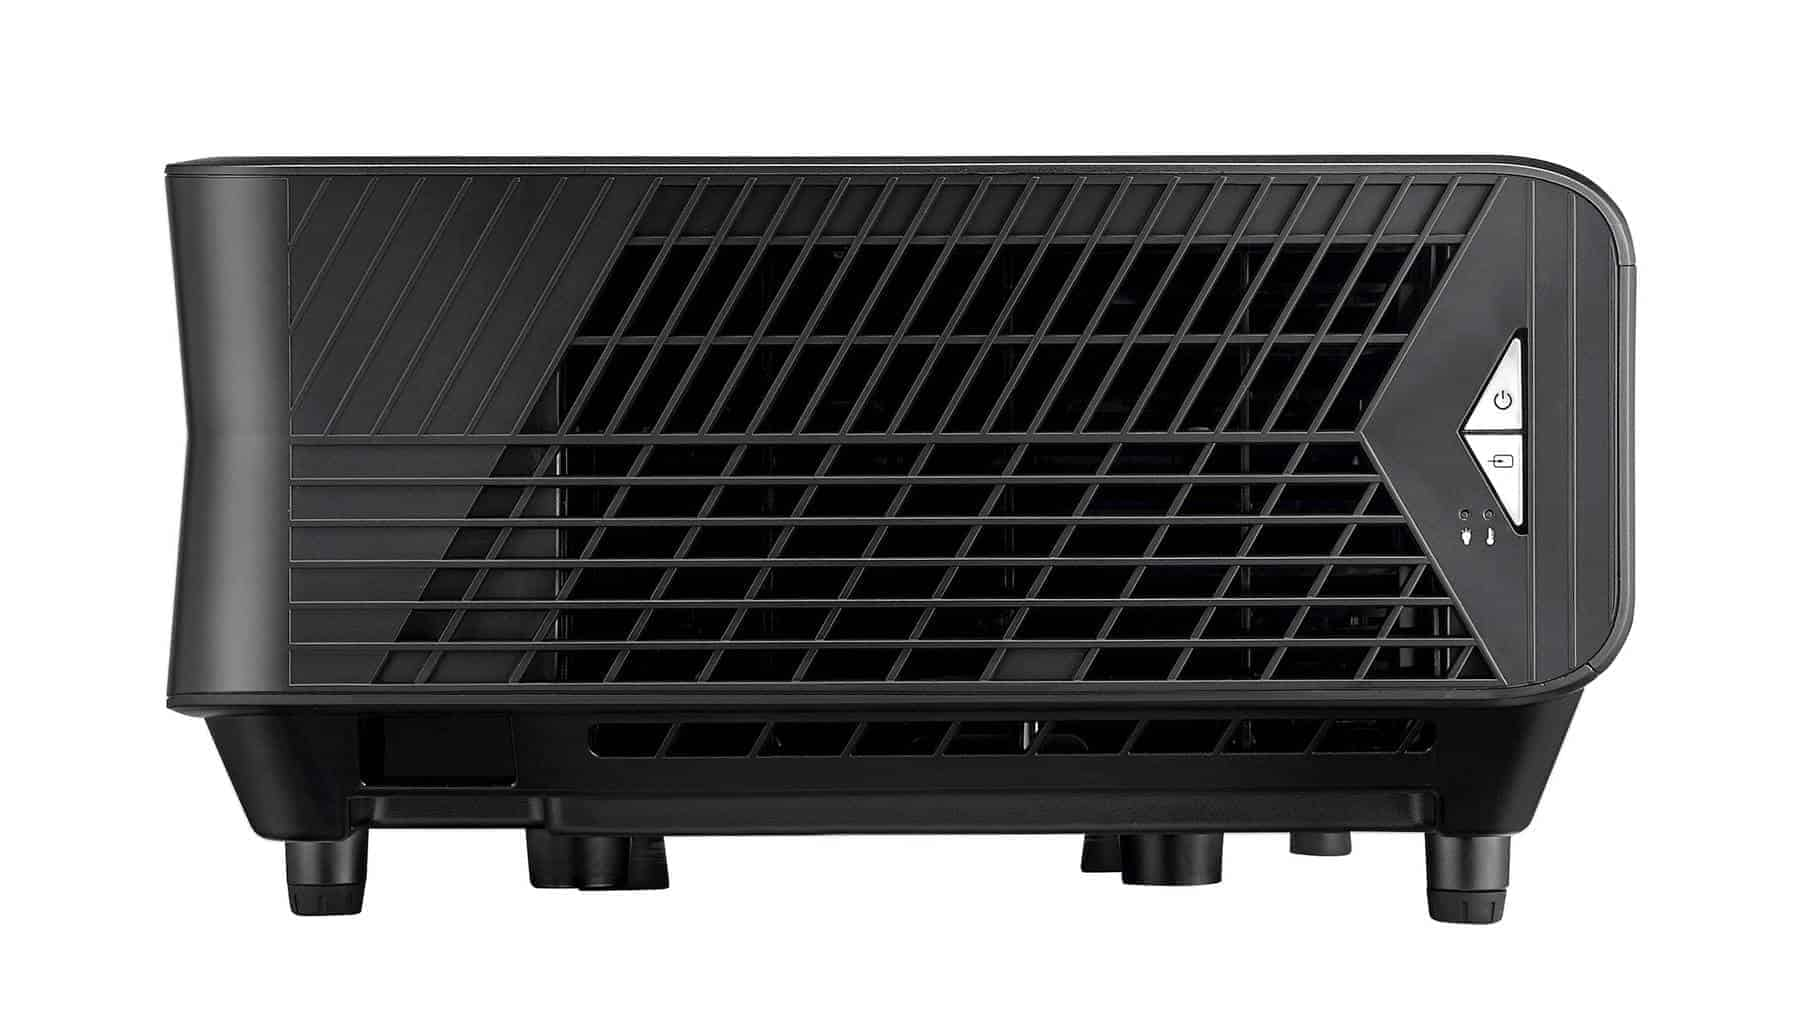 Optoma UHZ65 4K UHD Laserprojektor